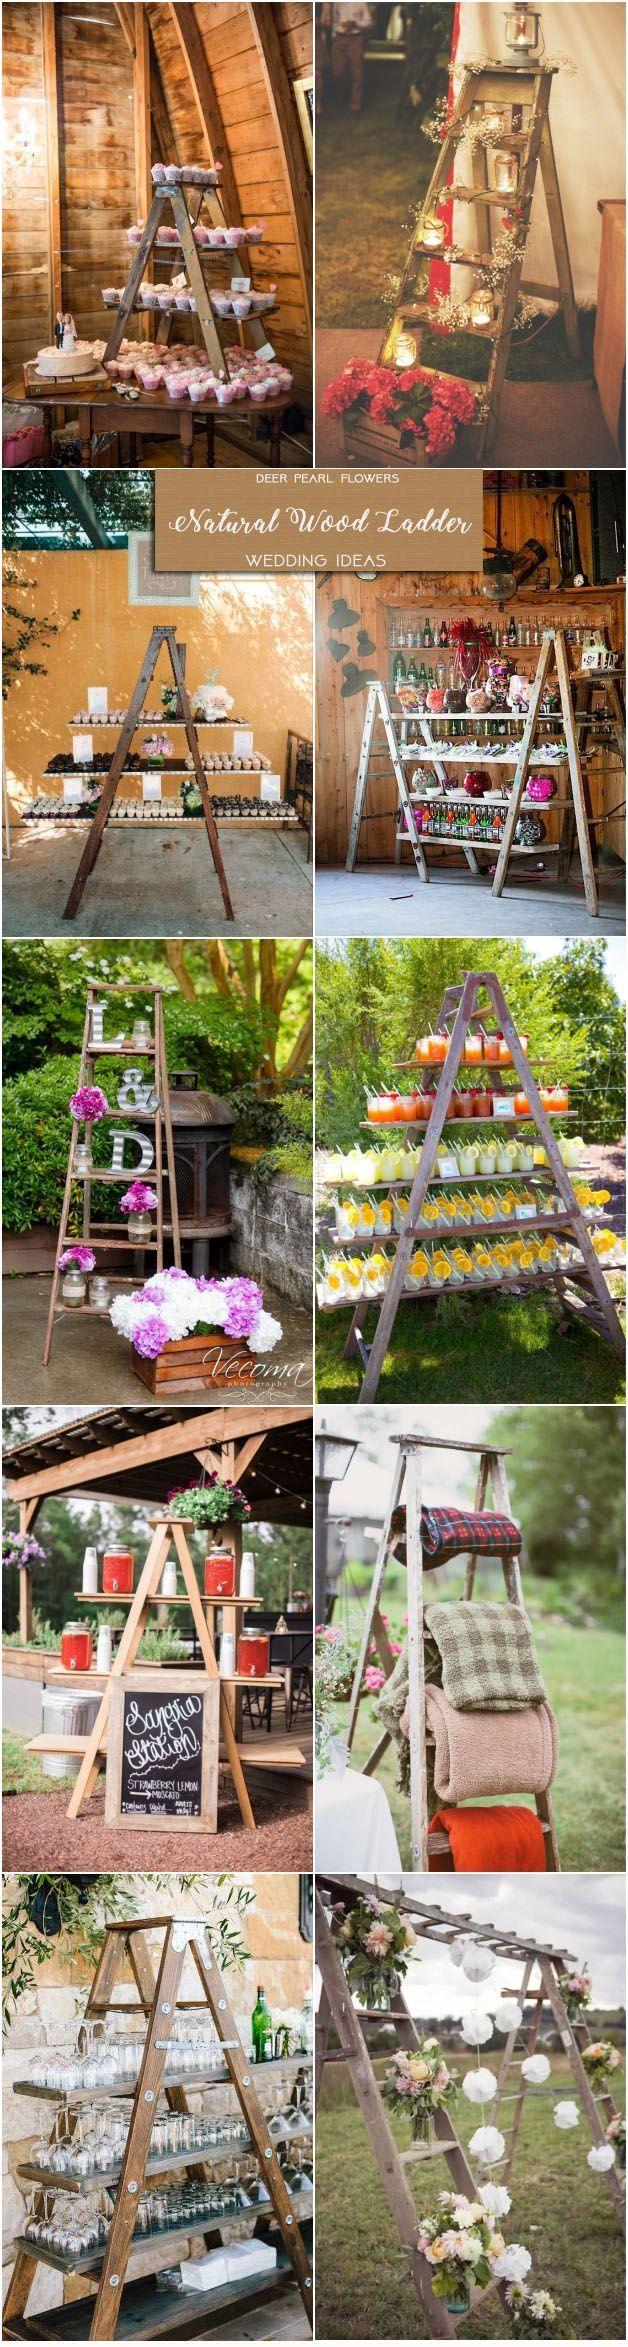 Rustic wedding ideas- natural wood ladder wedding decor ideas / http://www.deerpearlflowers.com/rustic-wedding-themes-ideas-part-2/